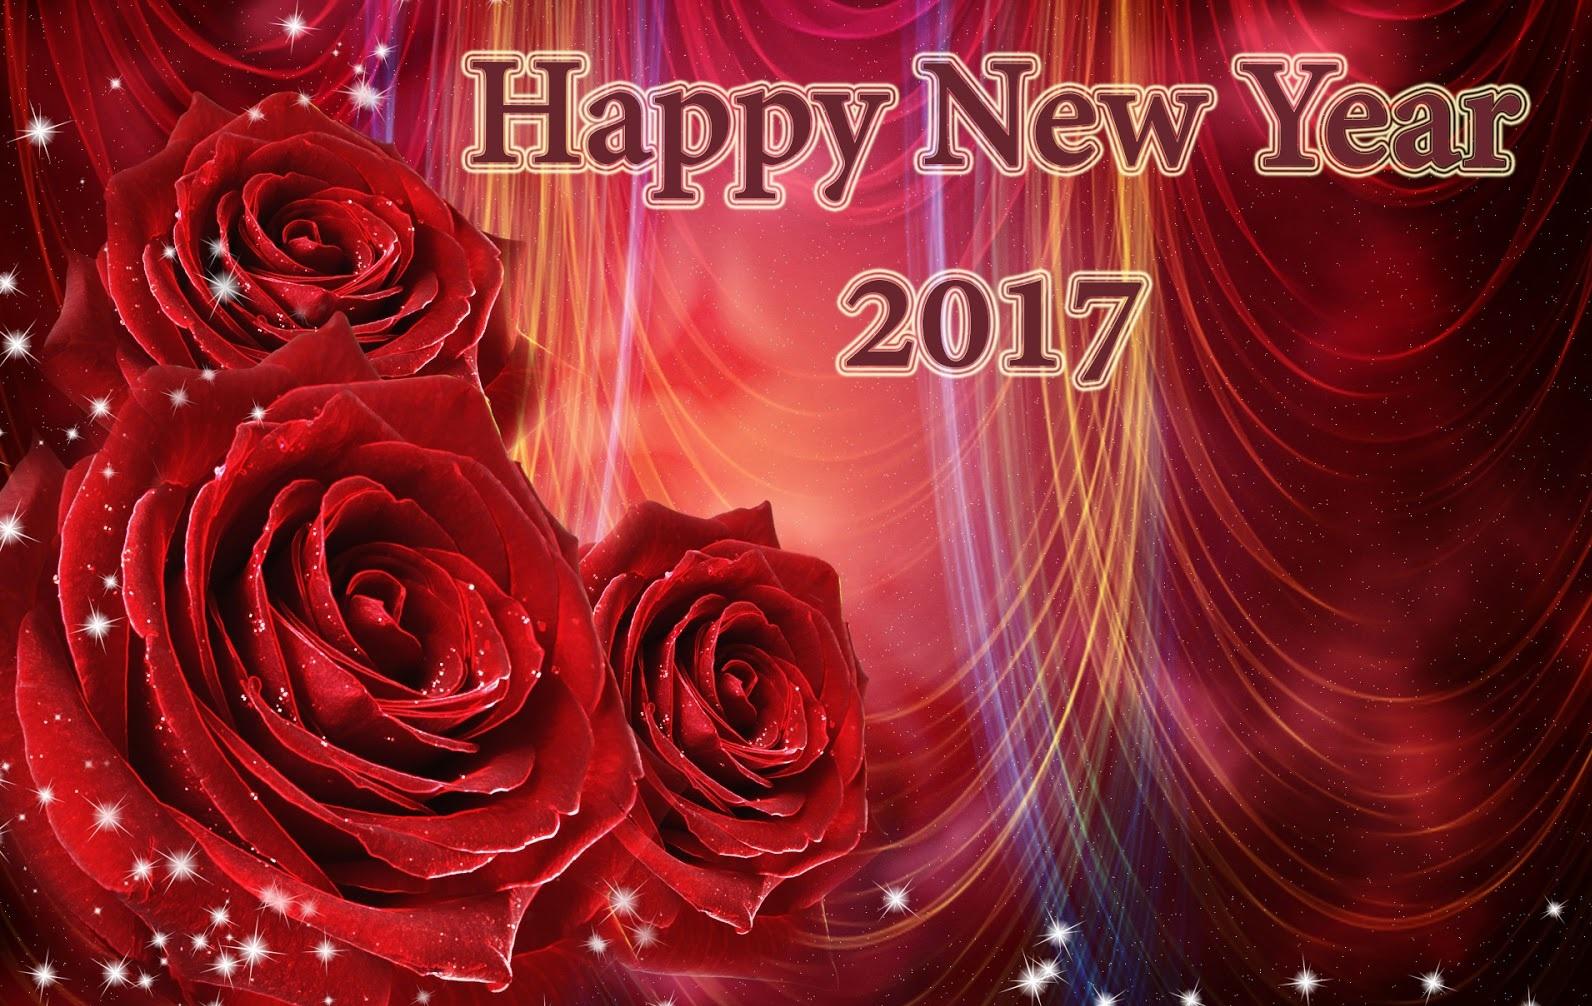 Wallpaper download hd 2017 - Wallpaper Download Hd 2017 8